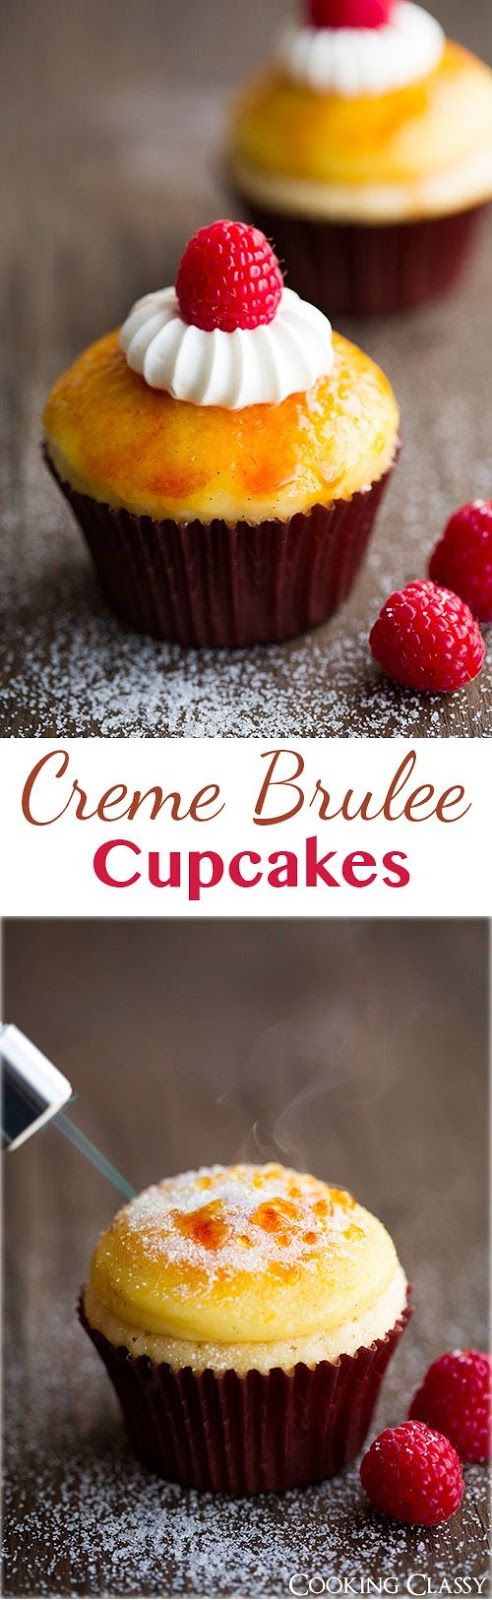 Creme Brulee Cupcakes Recipe